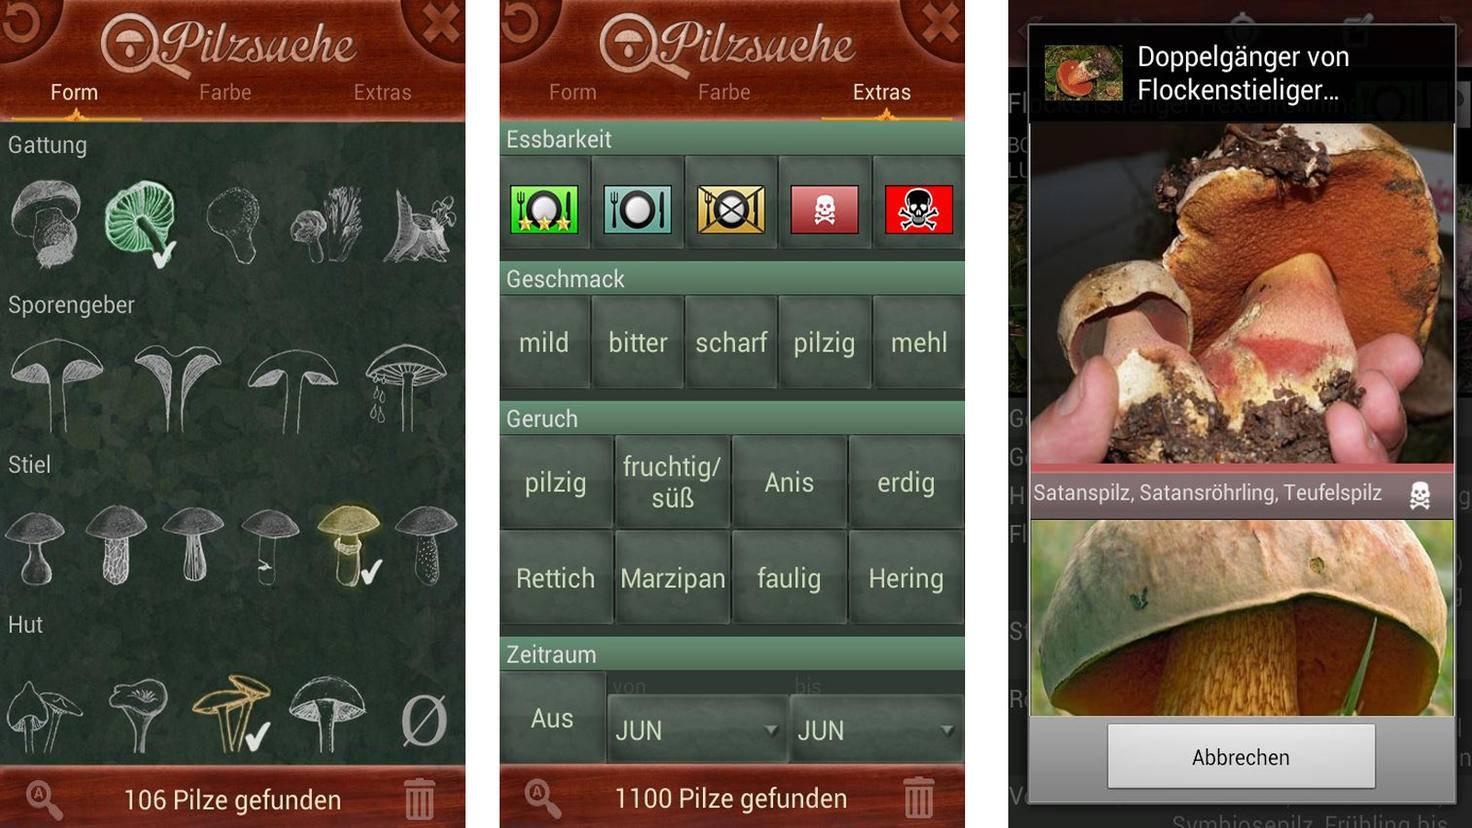 Pilzsuche Ultra-Google PlayStore-Mykomedia